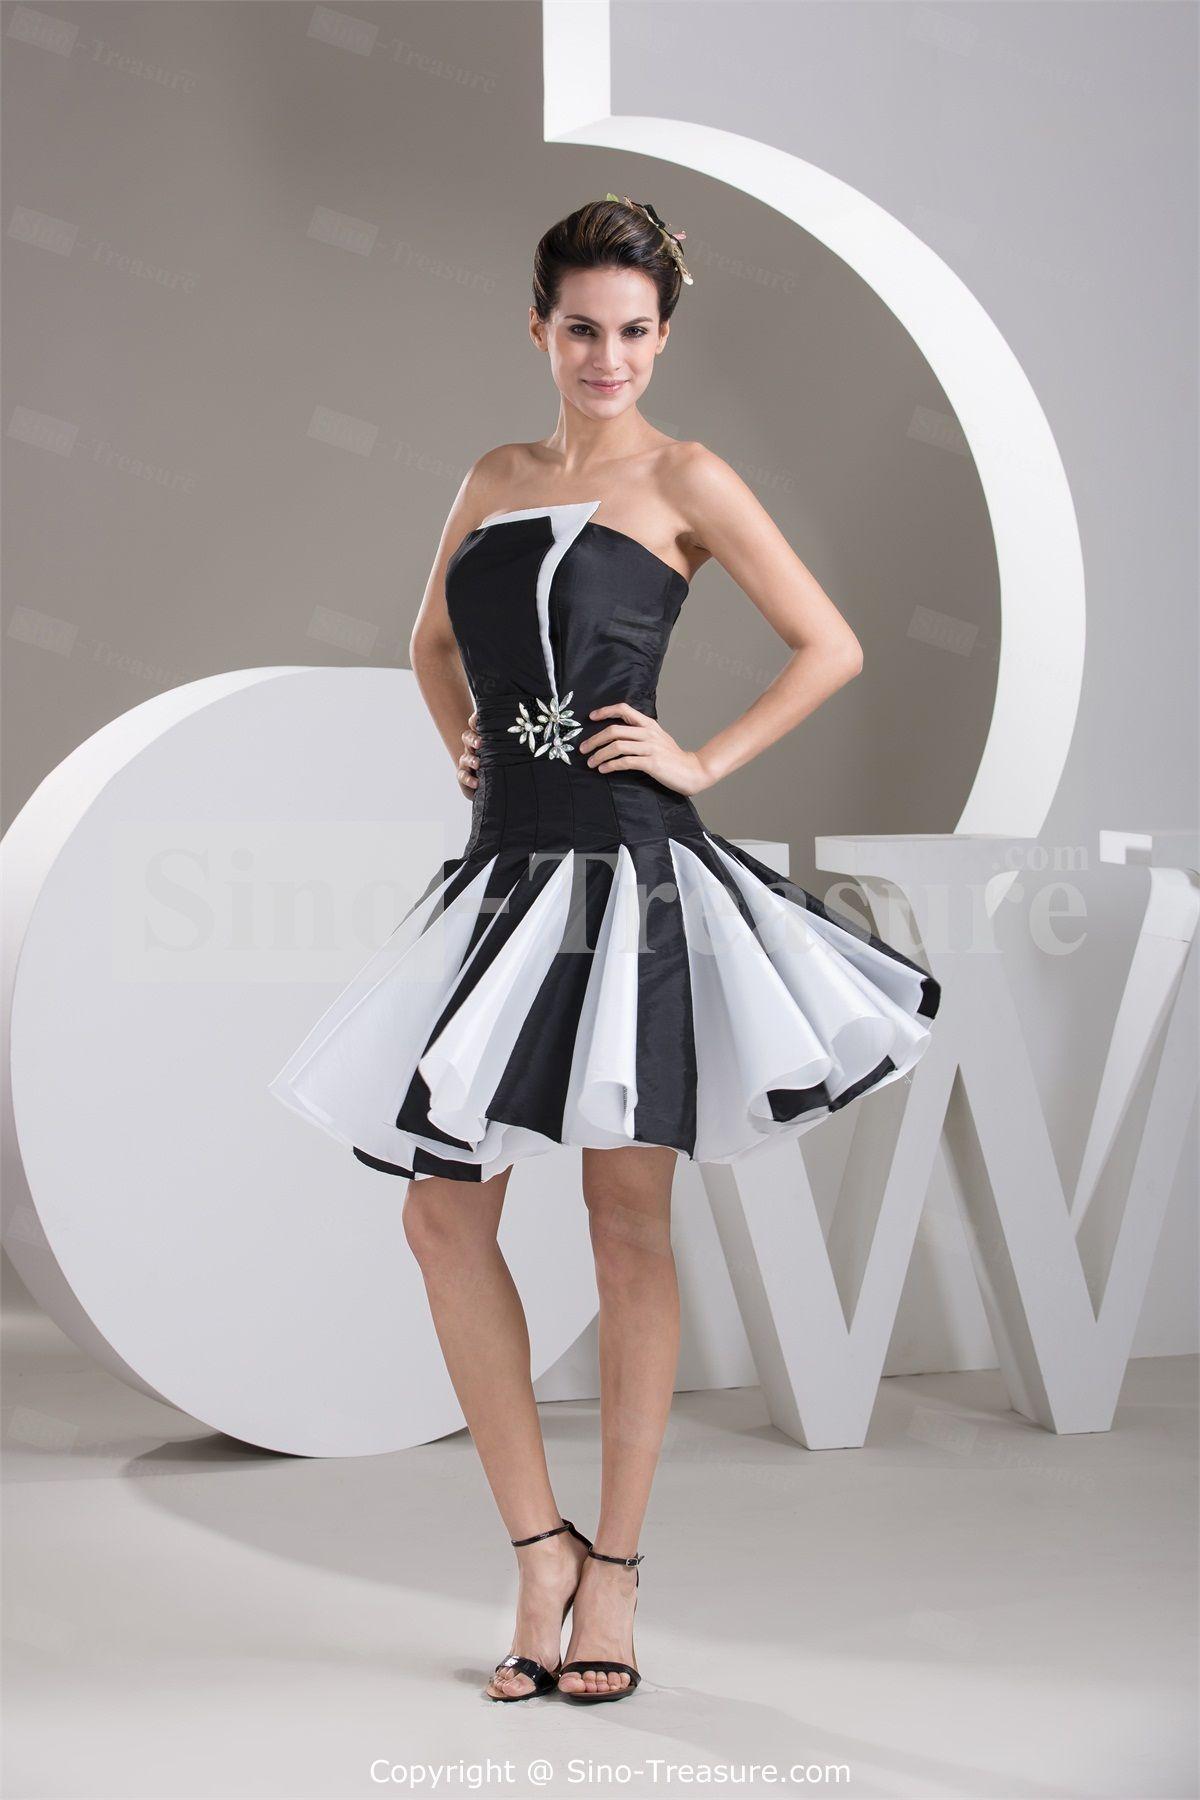 short black wedding dresses Black White Strapless A line Short Taffeta Cocktail Dress Homecoming Dress